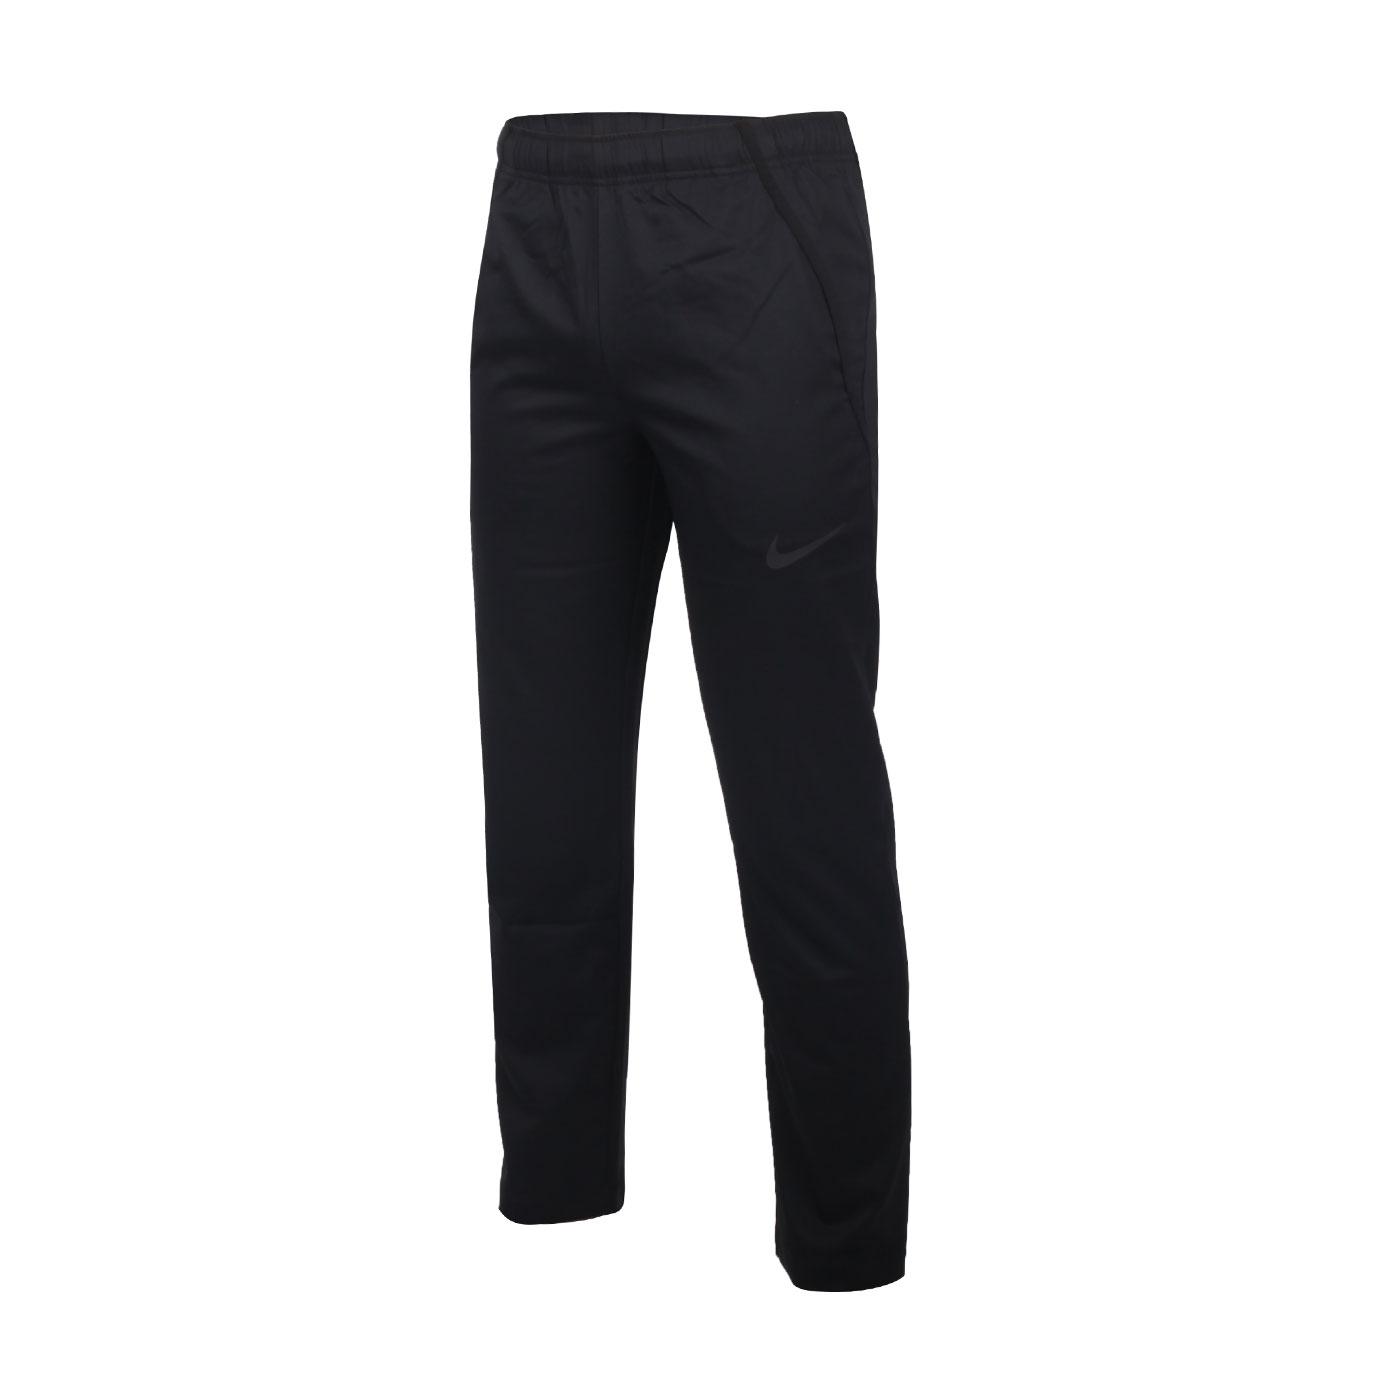 NIKE 男款梭織訓練長褲 CU4958-010 - 黑